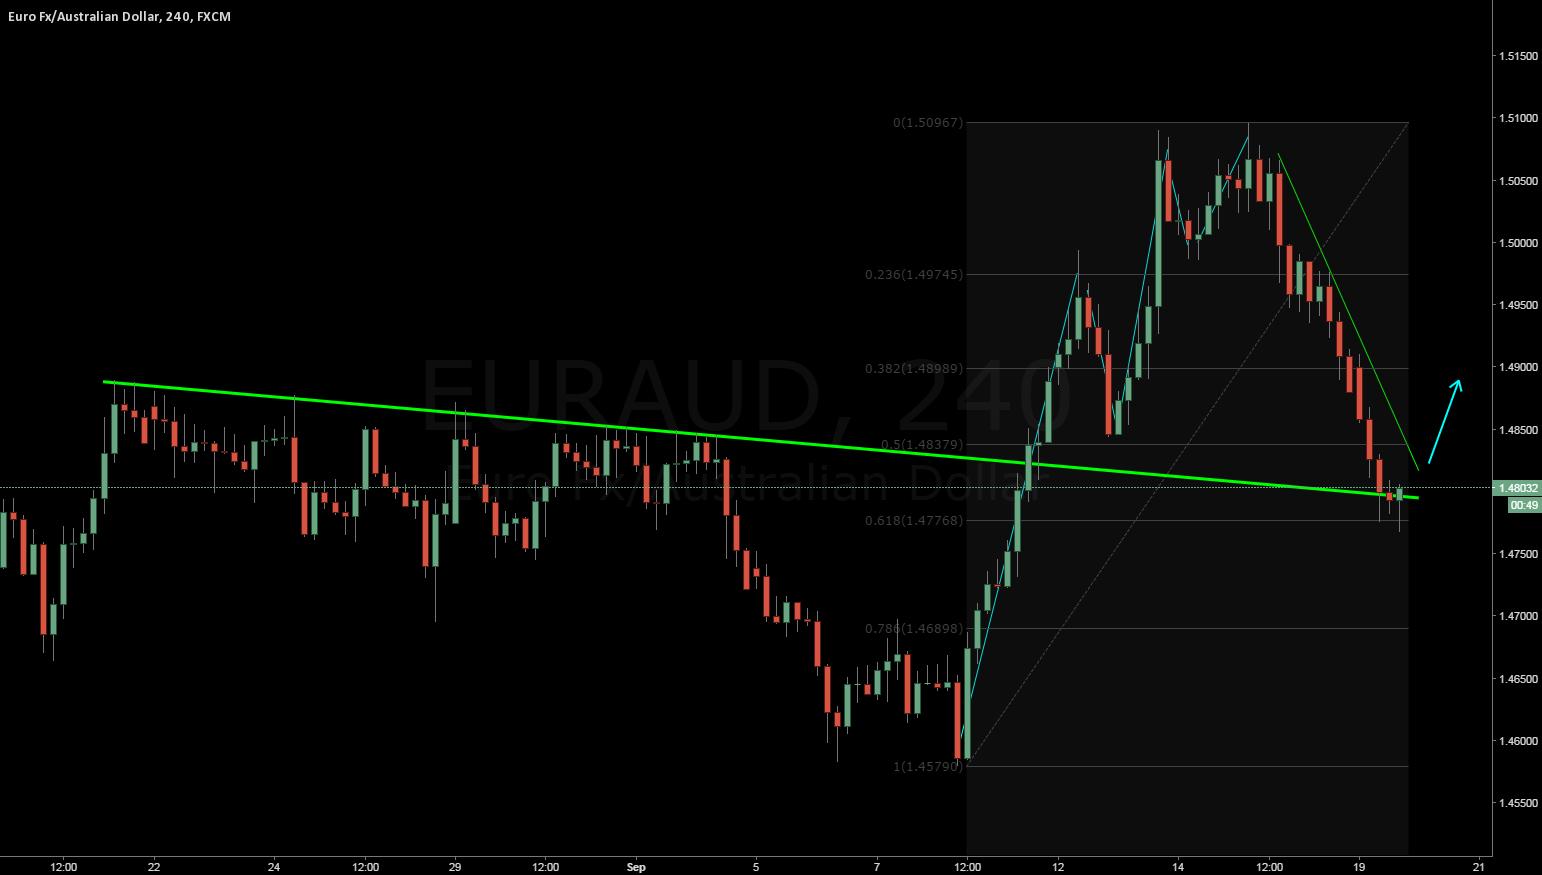 EURAUD convergence: Buy signal